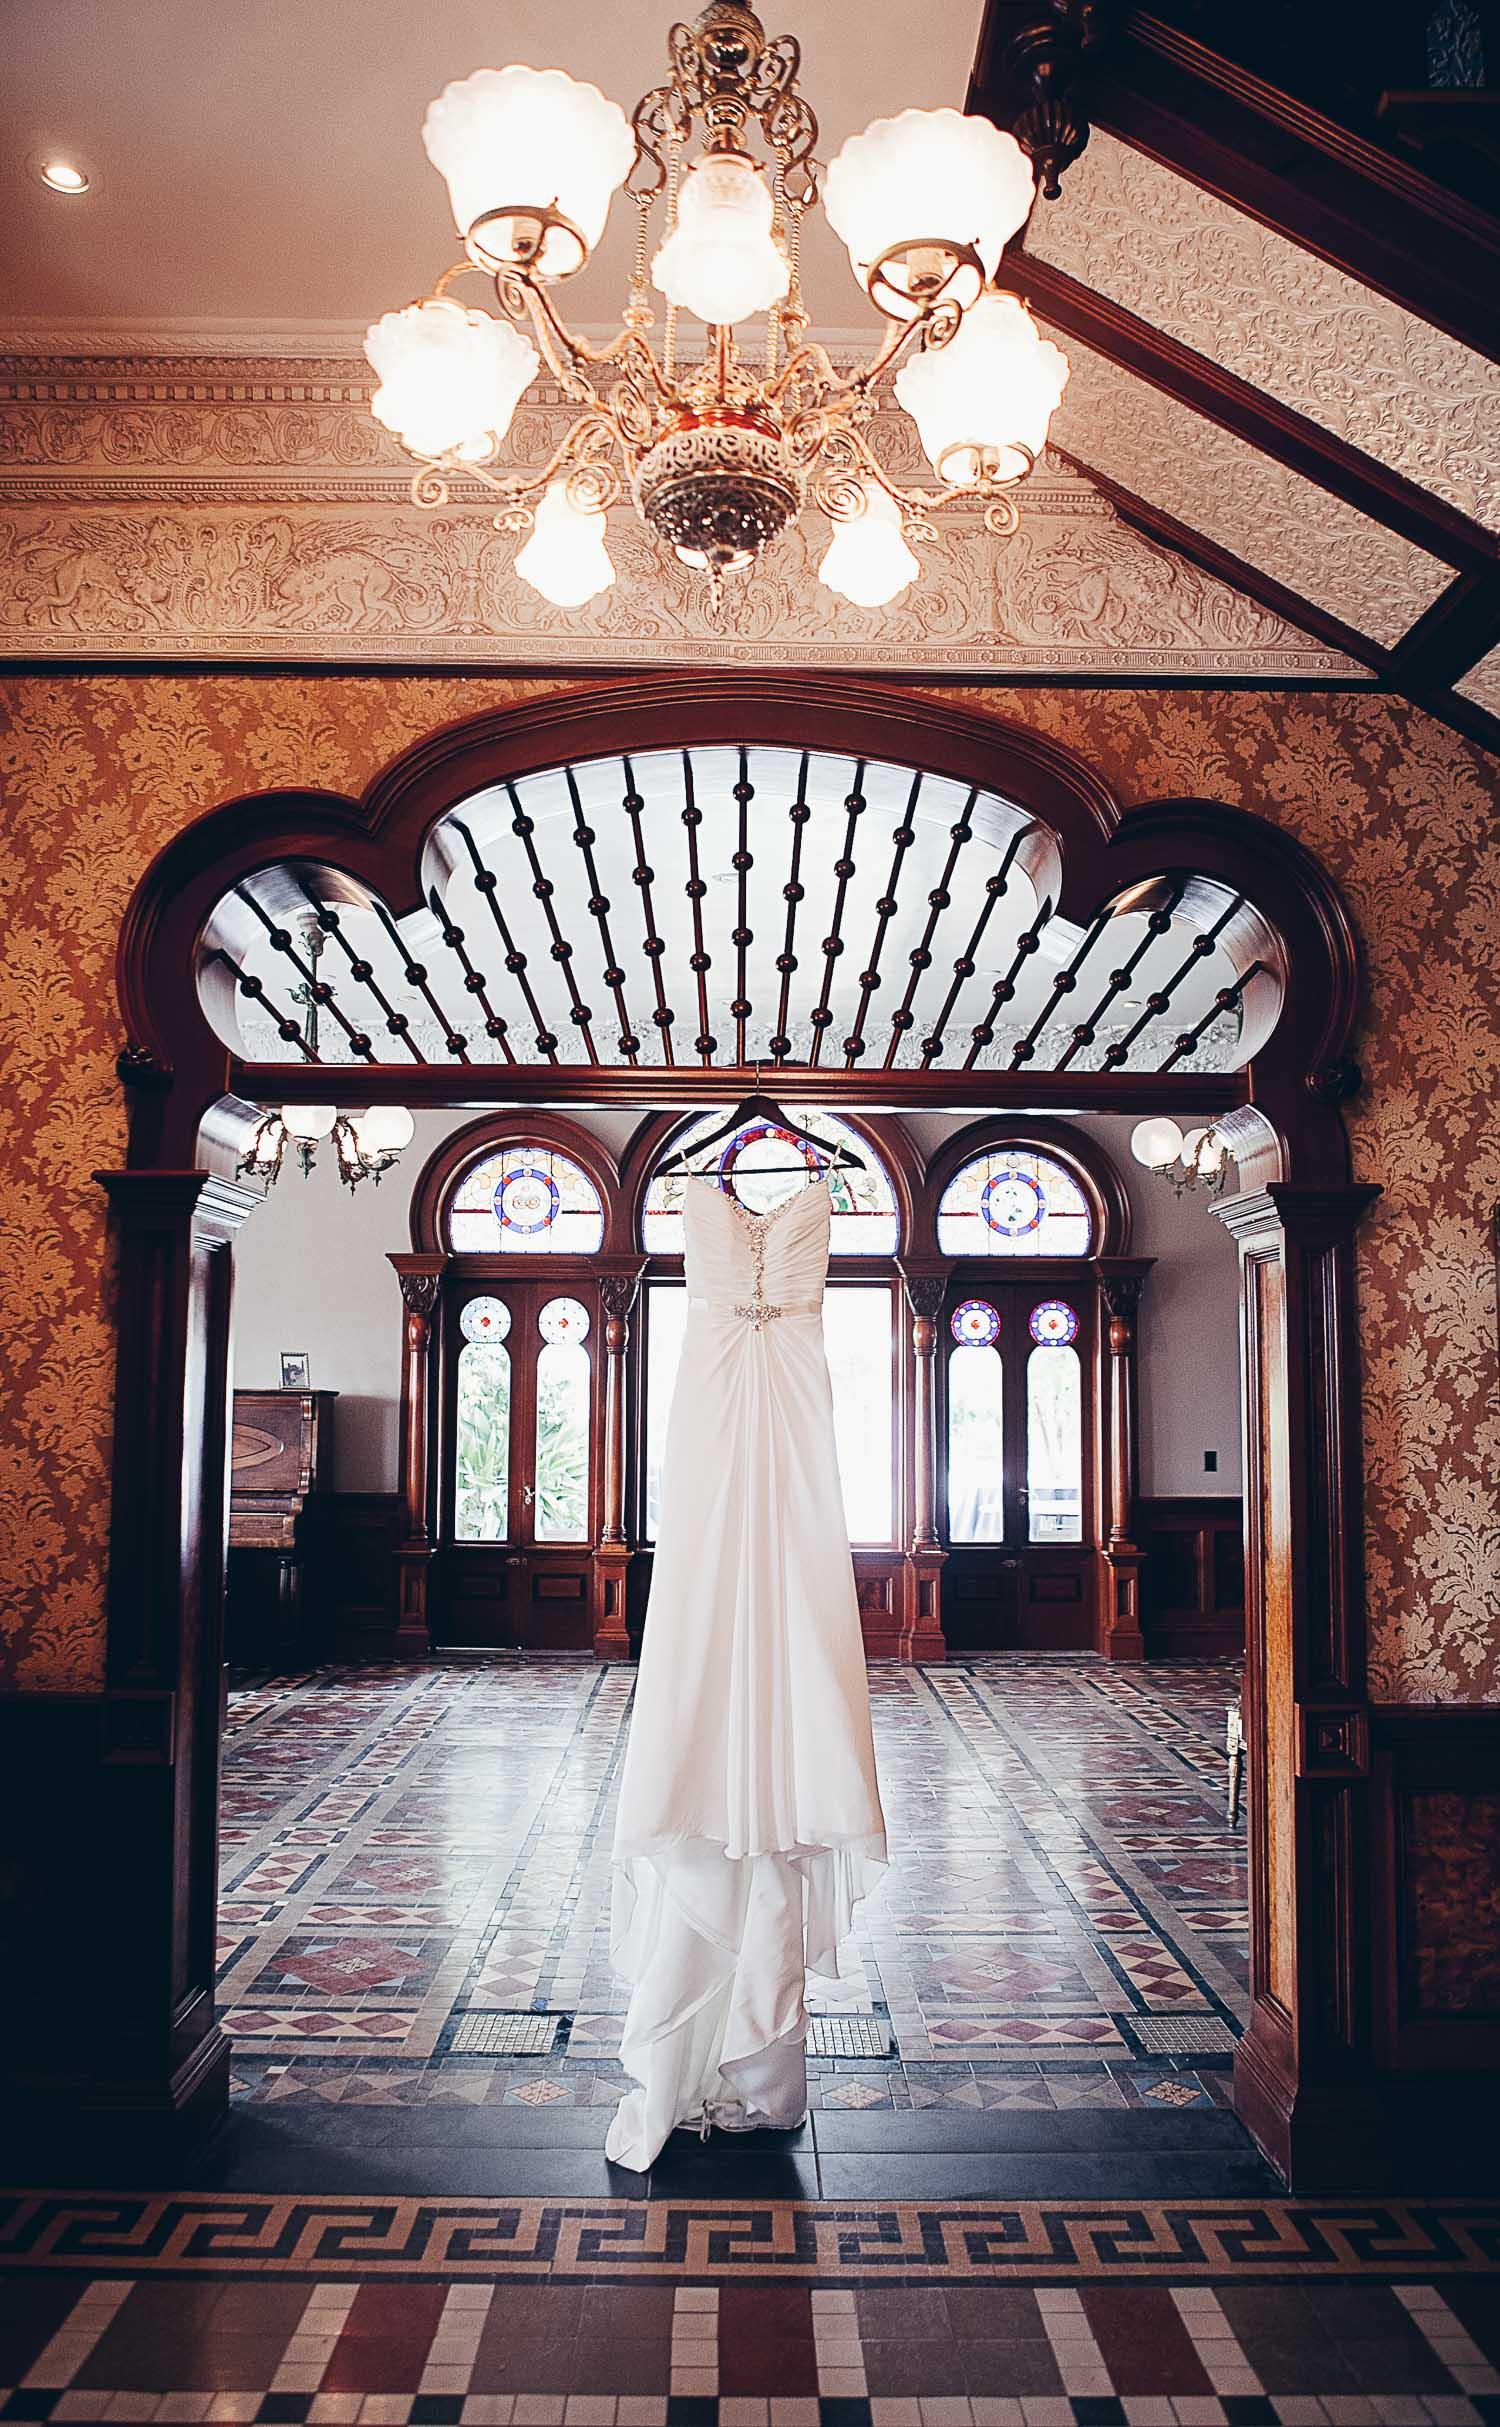 JMPHOTOART-Wedding-Photographer-7.jpg